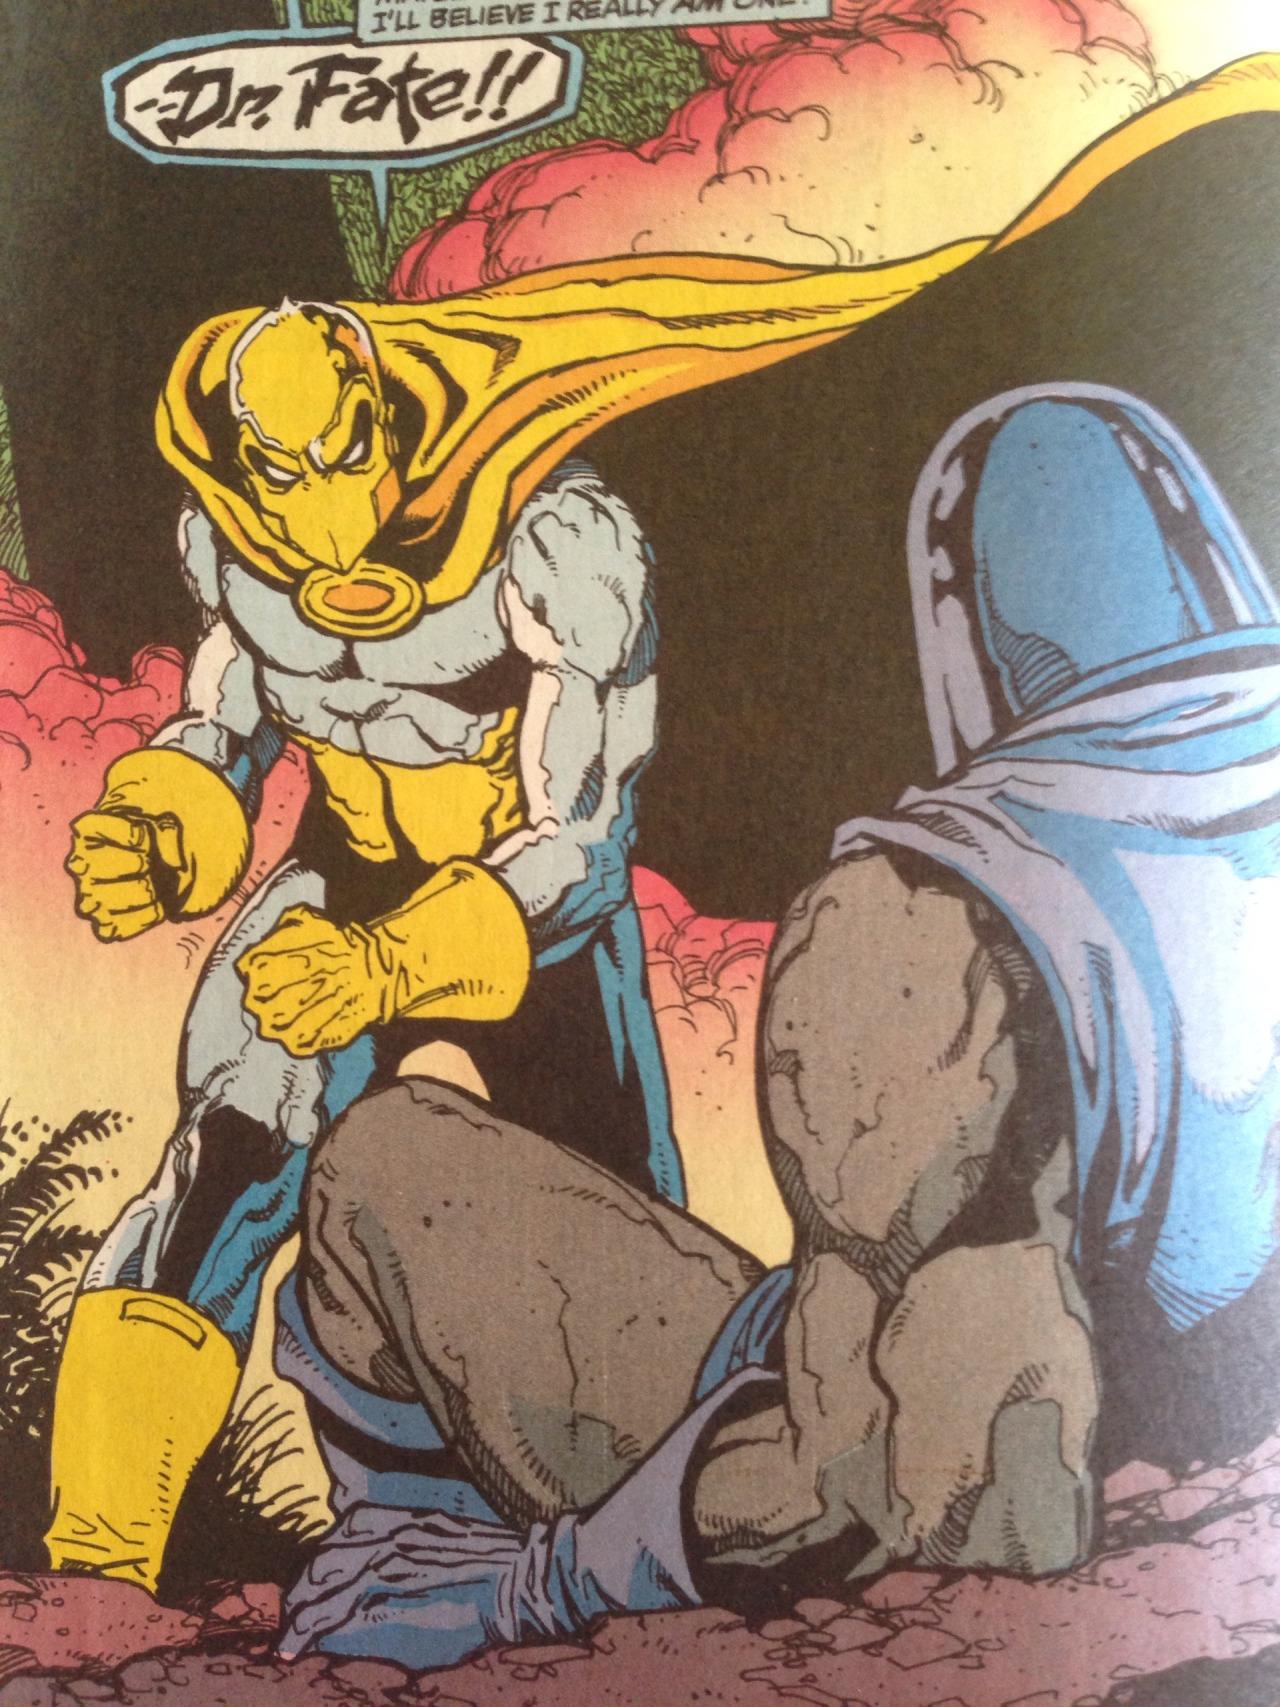 Nouveau Tournoi des Personnages DC Comics ! - Page 3 Tumblr_ny6nru0QAD1s9xzi5o1_1280